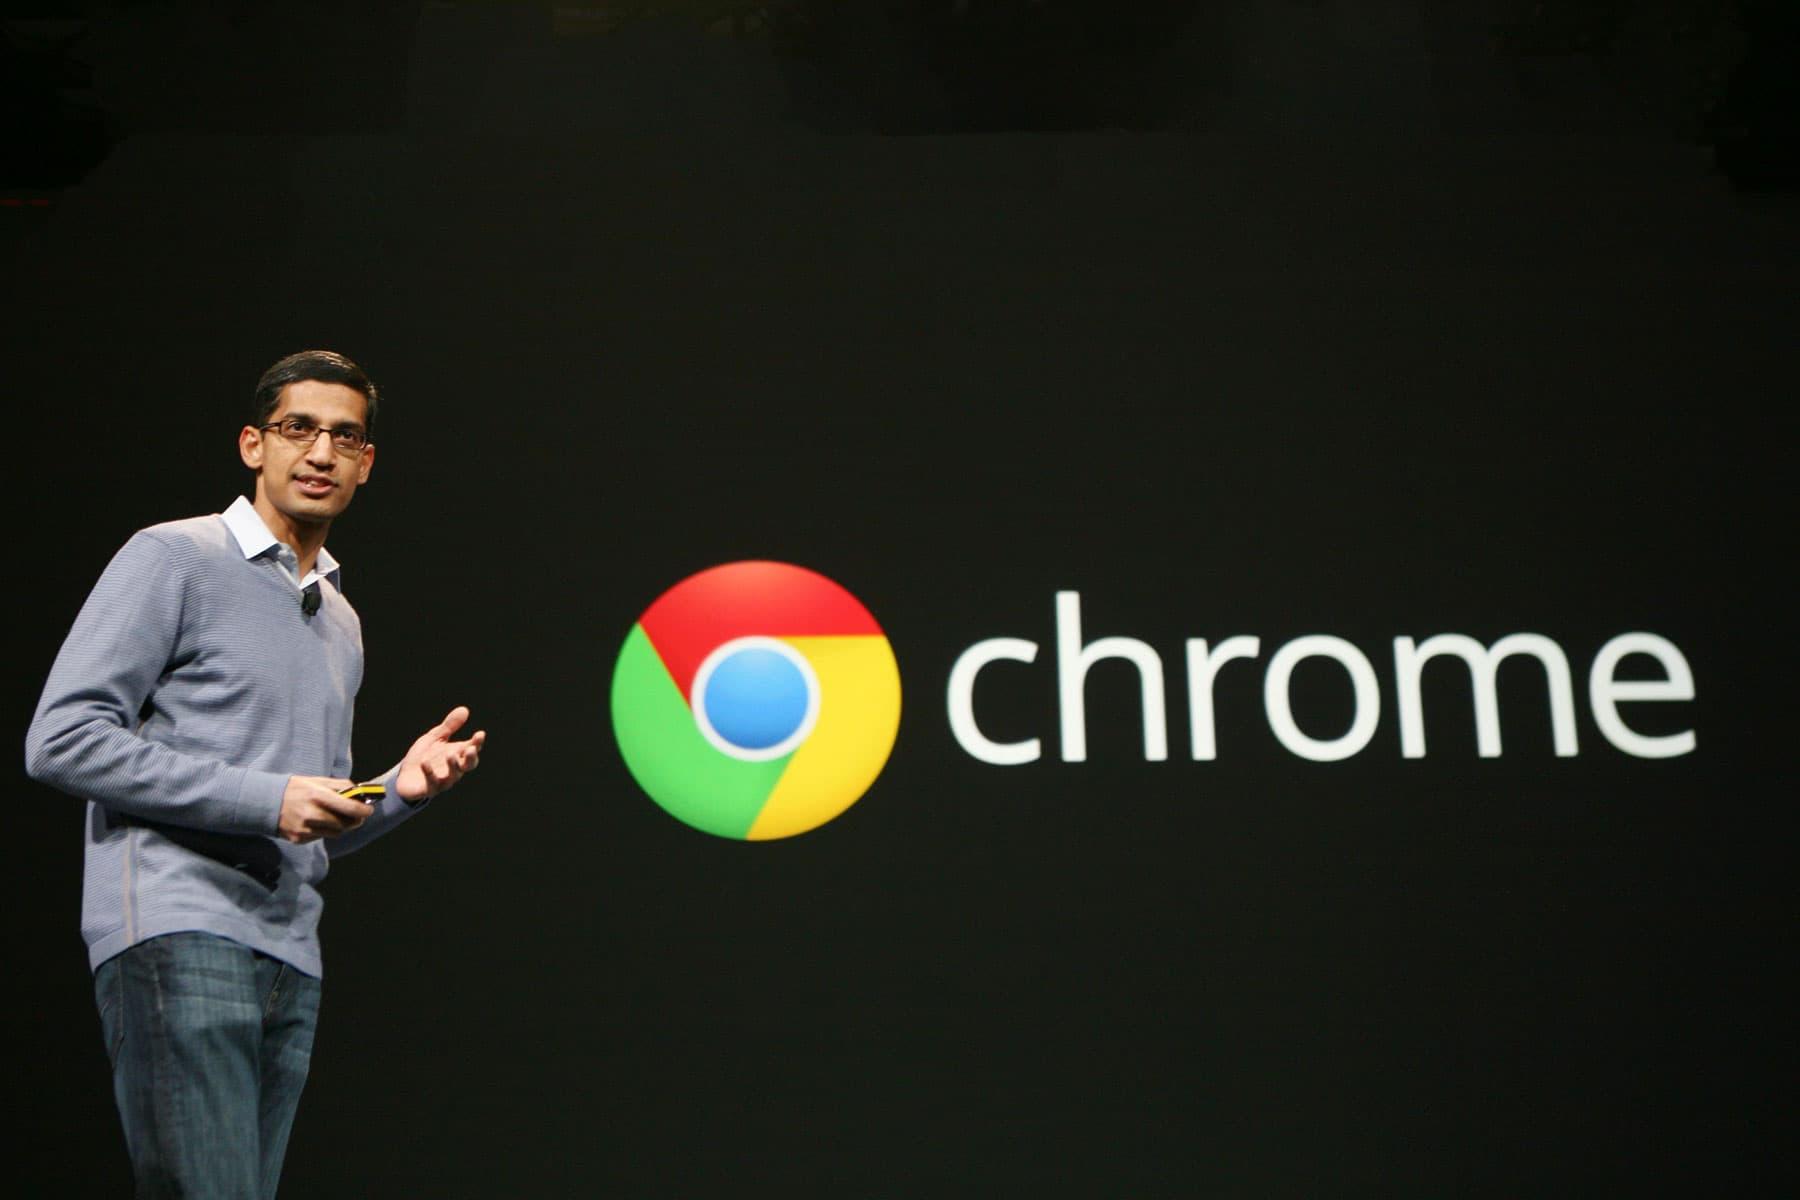 Google Finally Shuts Down Chrome Applications on Mac and Windows